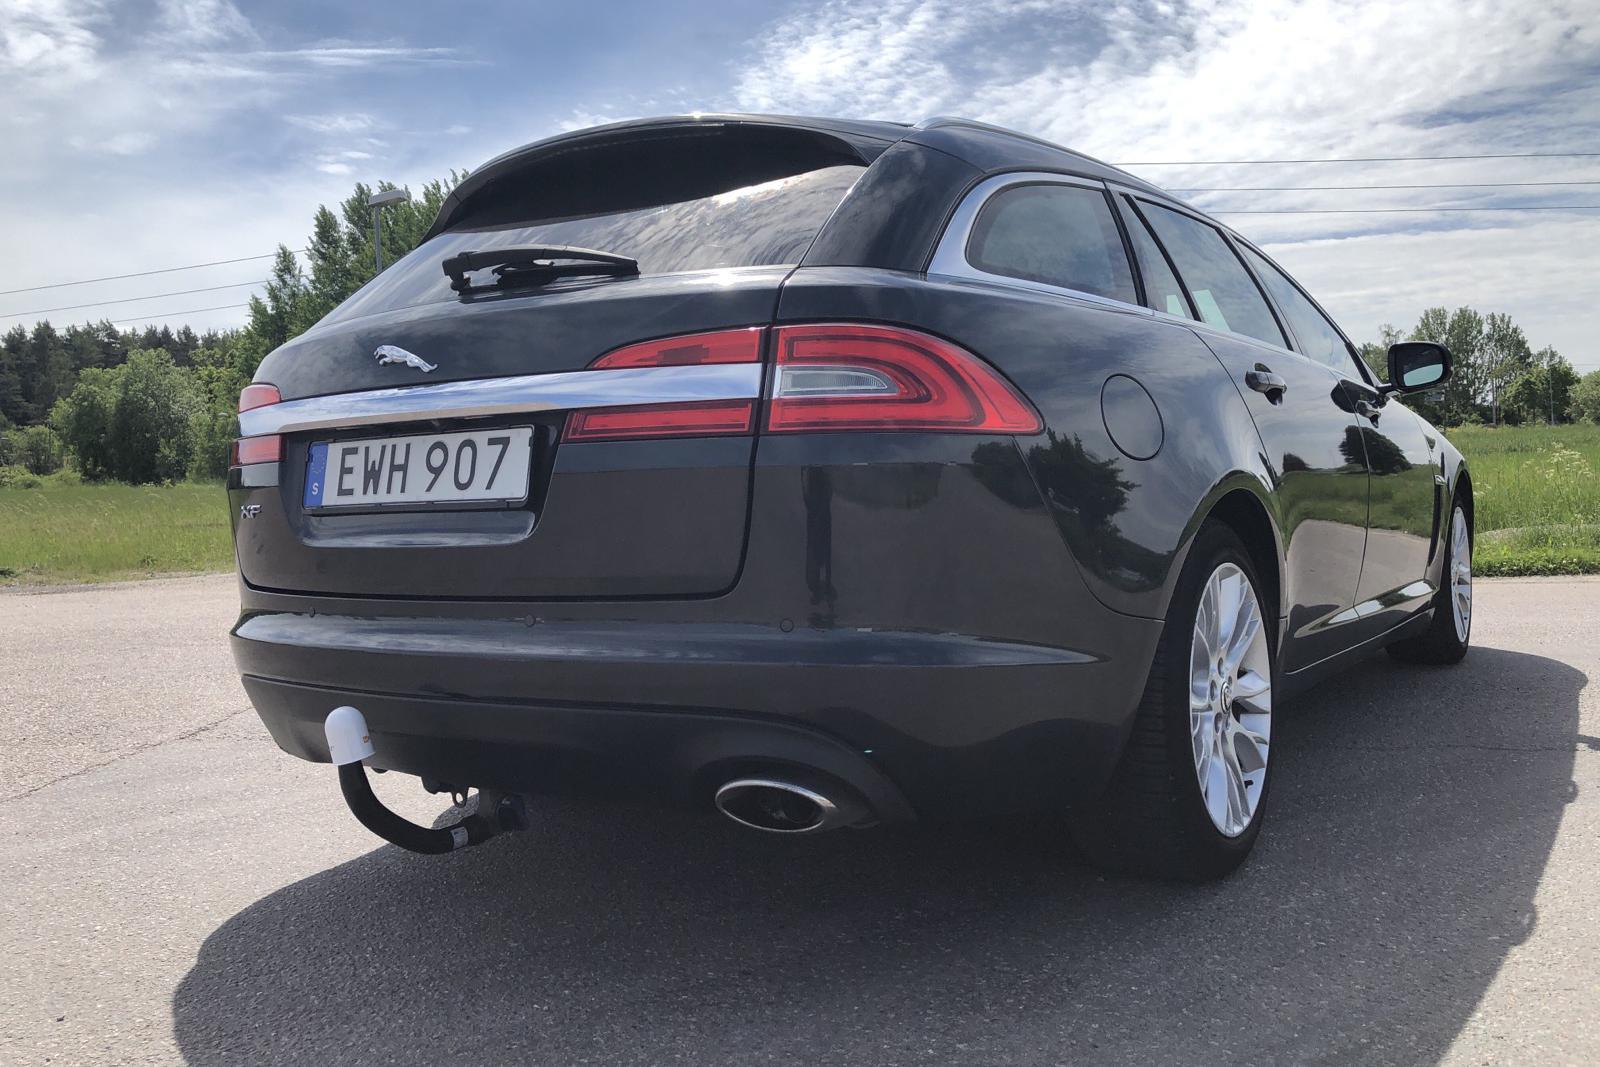 Jaguar XF Sportbrake 2.2 TDi4 (200hk) - 24 725 mil - Automat - Dark Grey - 2013